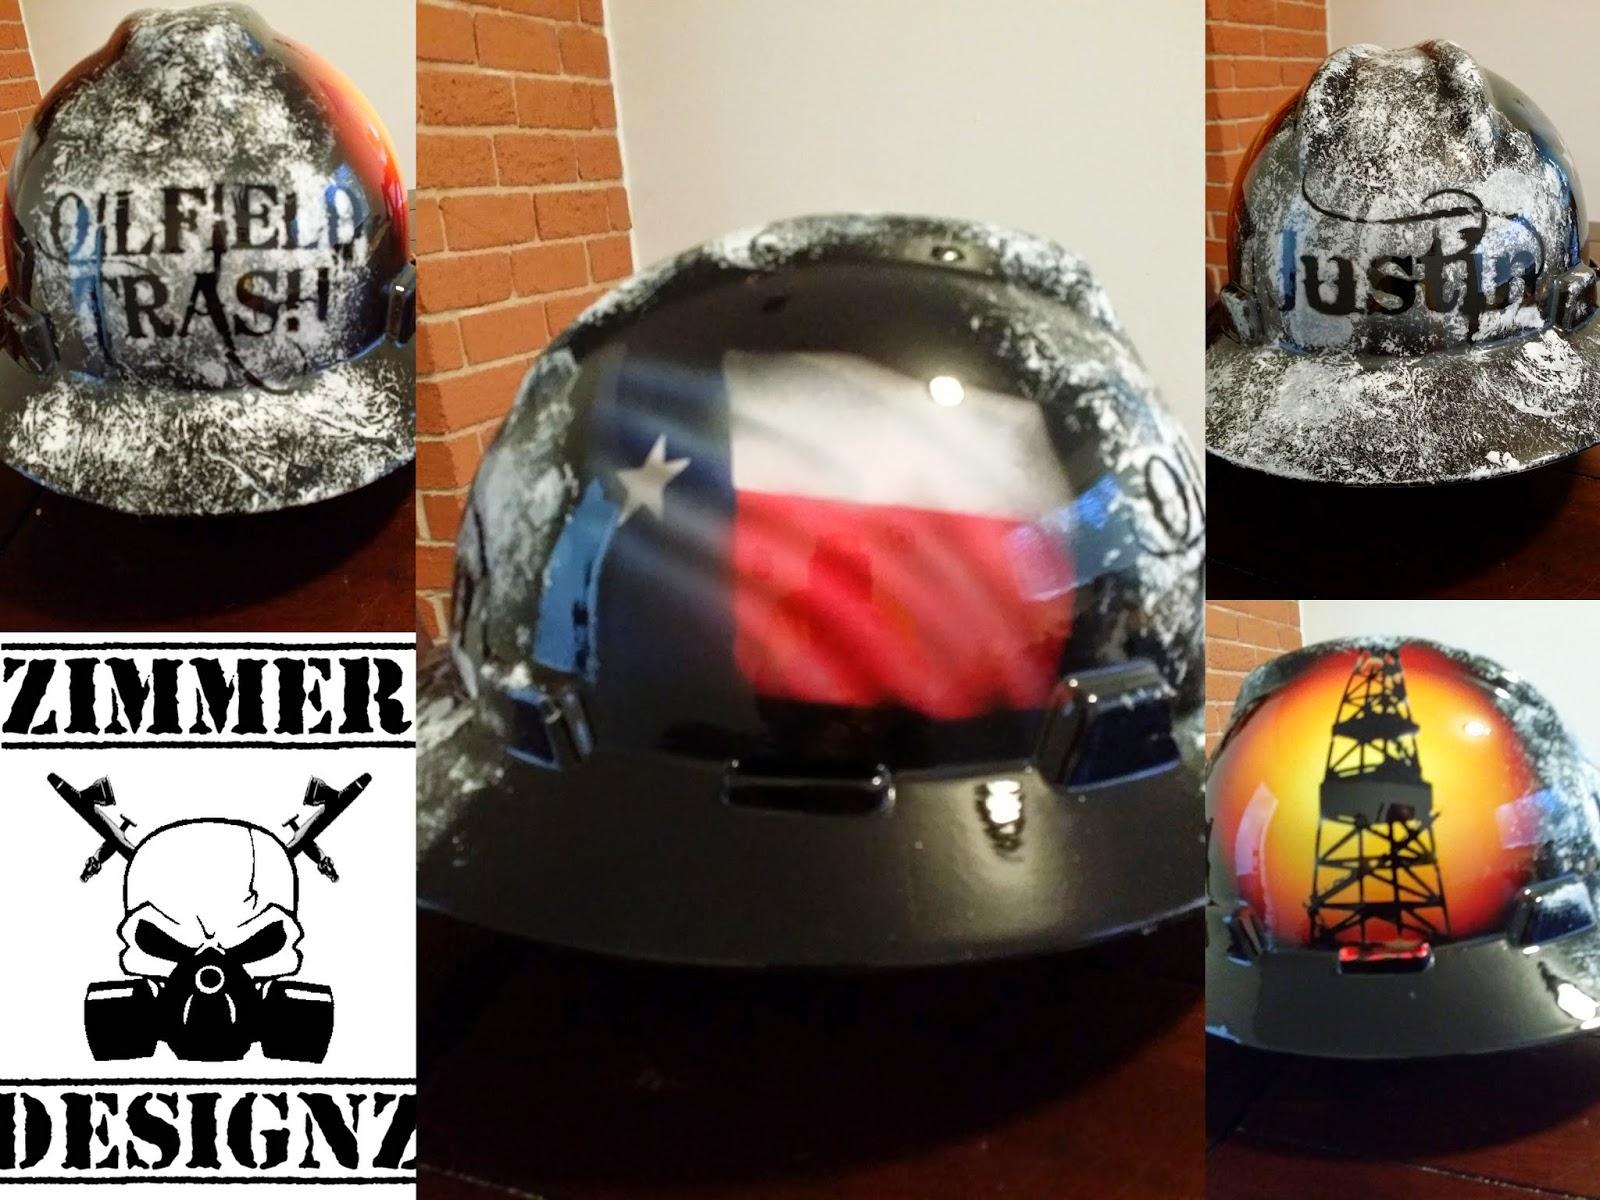 buy online 69bfb e2ab9 ... usa lone star oilfield trash custom hard hat 591eb 70041 ...